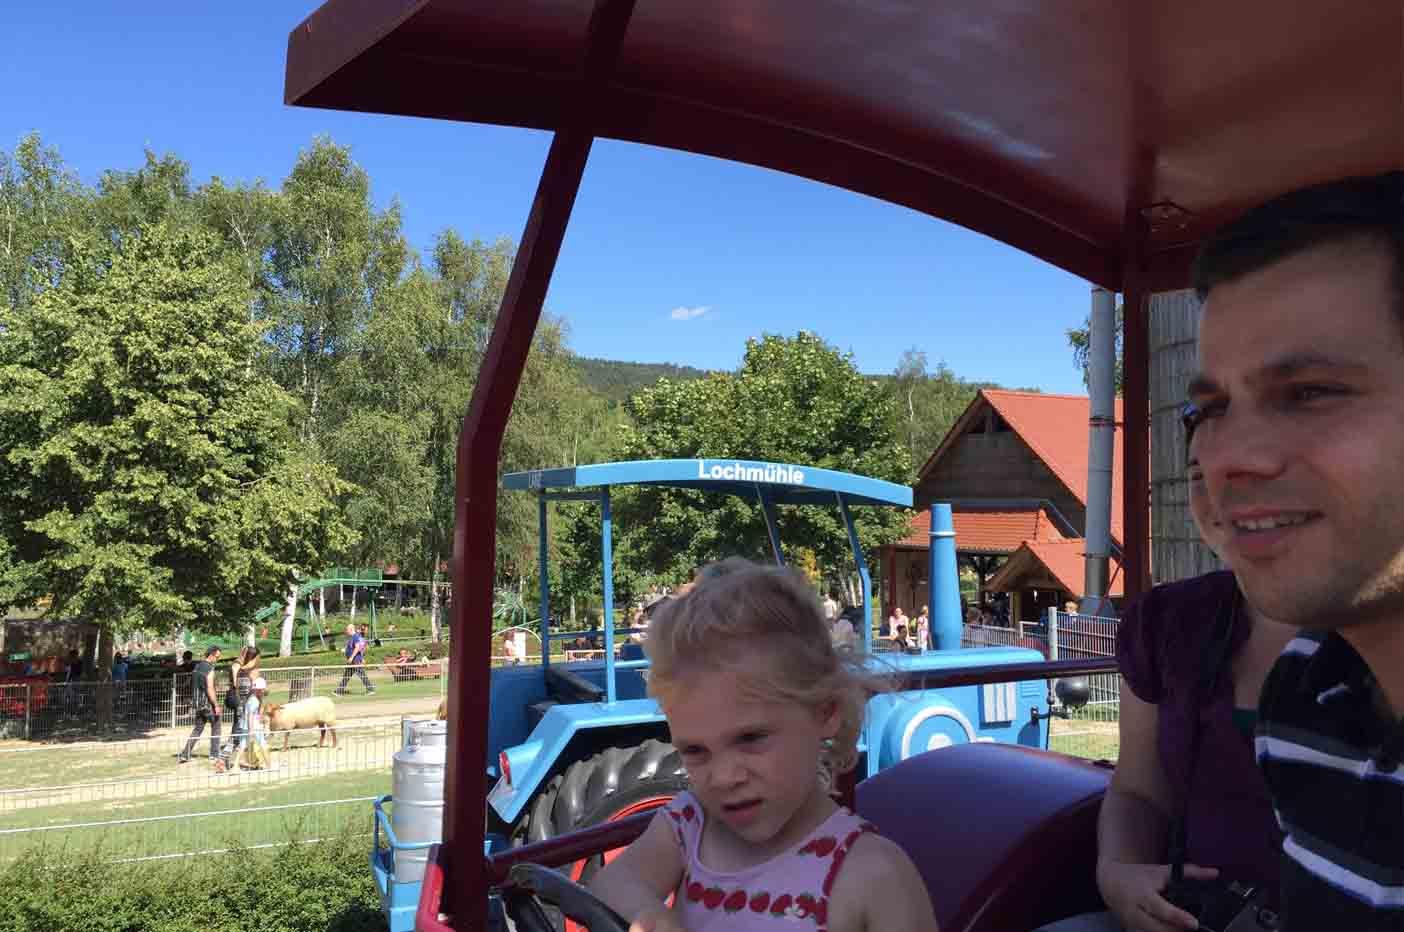 pretpark Lochmühle